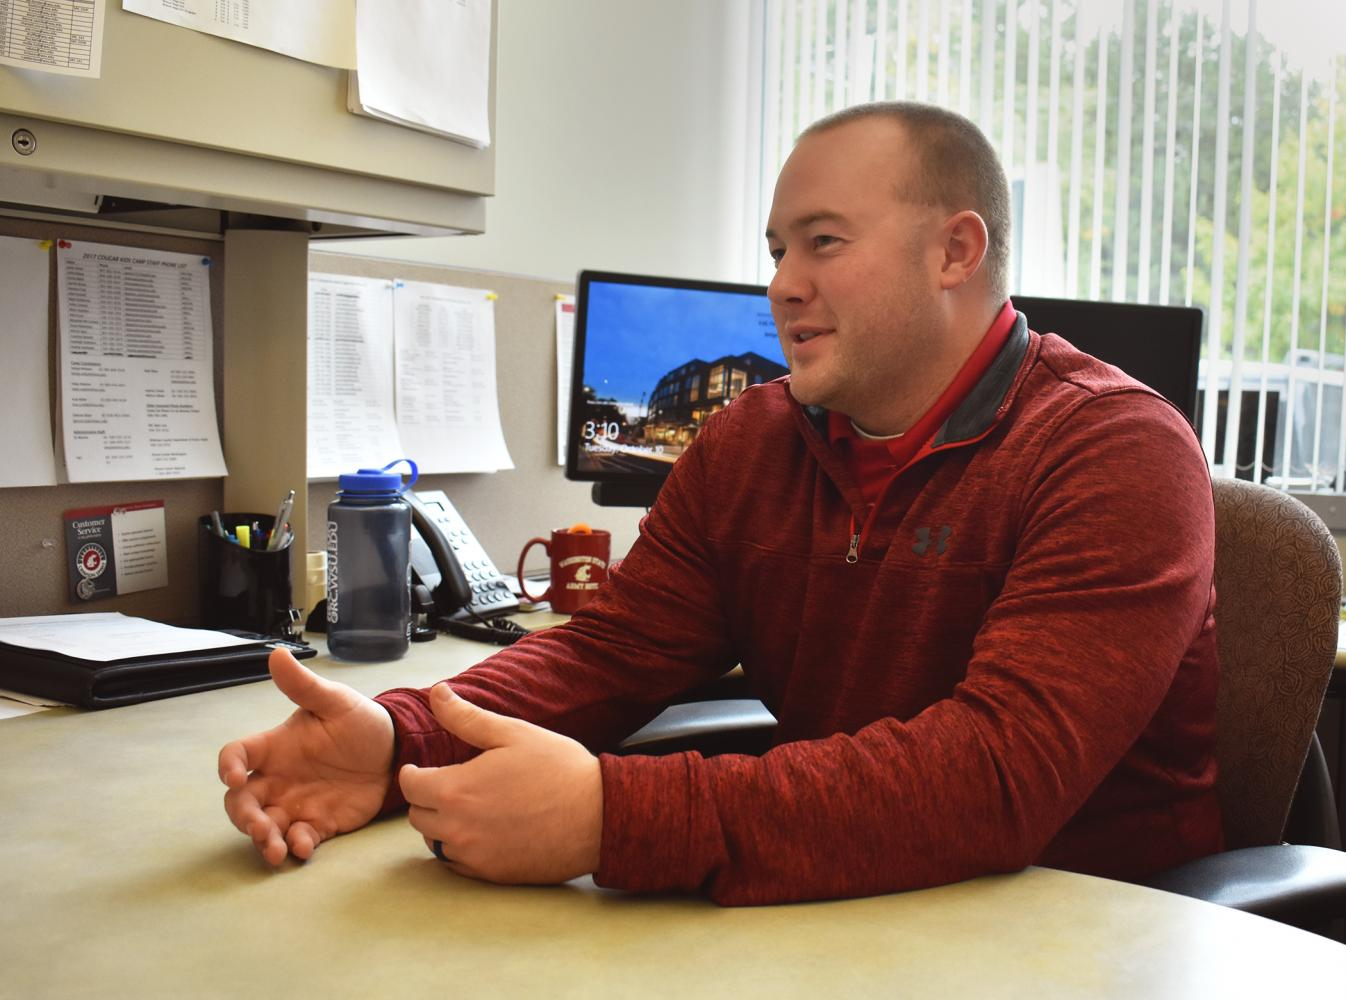 DJ Mackie explains UREC's efforts to meet students' high expectations.